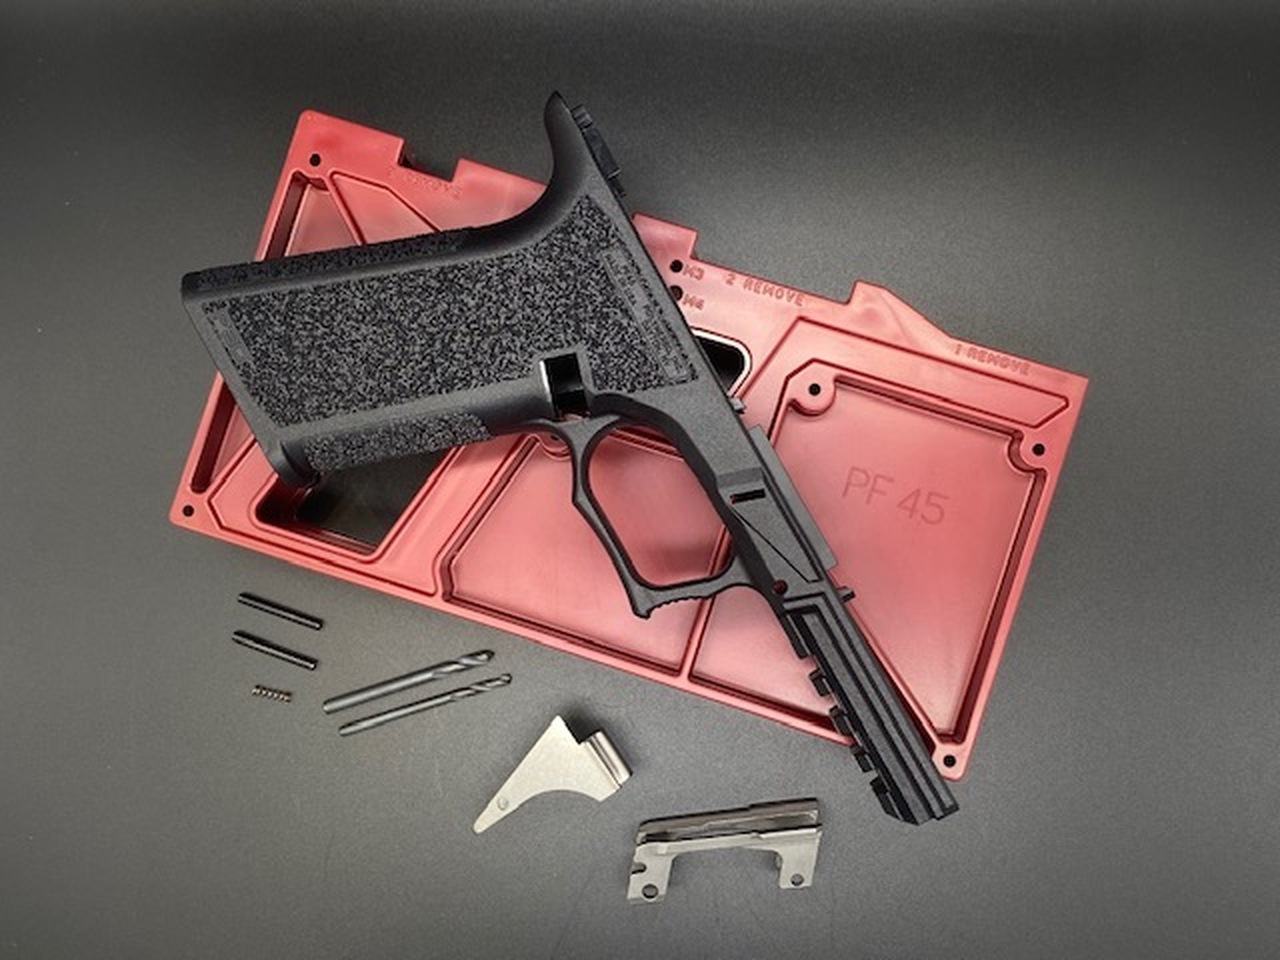 PF45 Full Size Glock 21/20 Compatible 80% Pistol Frame Kit